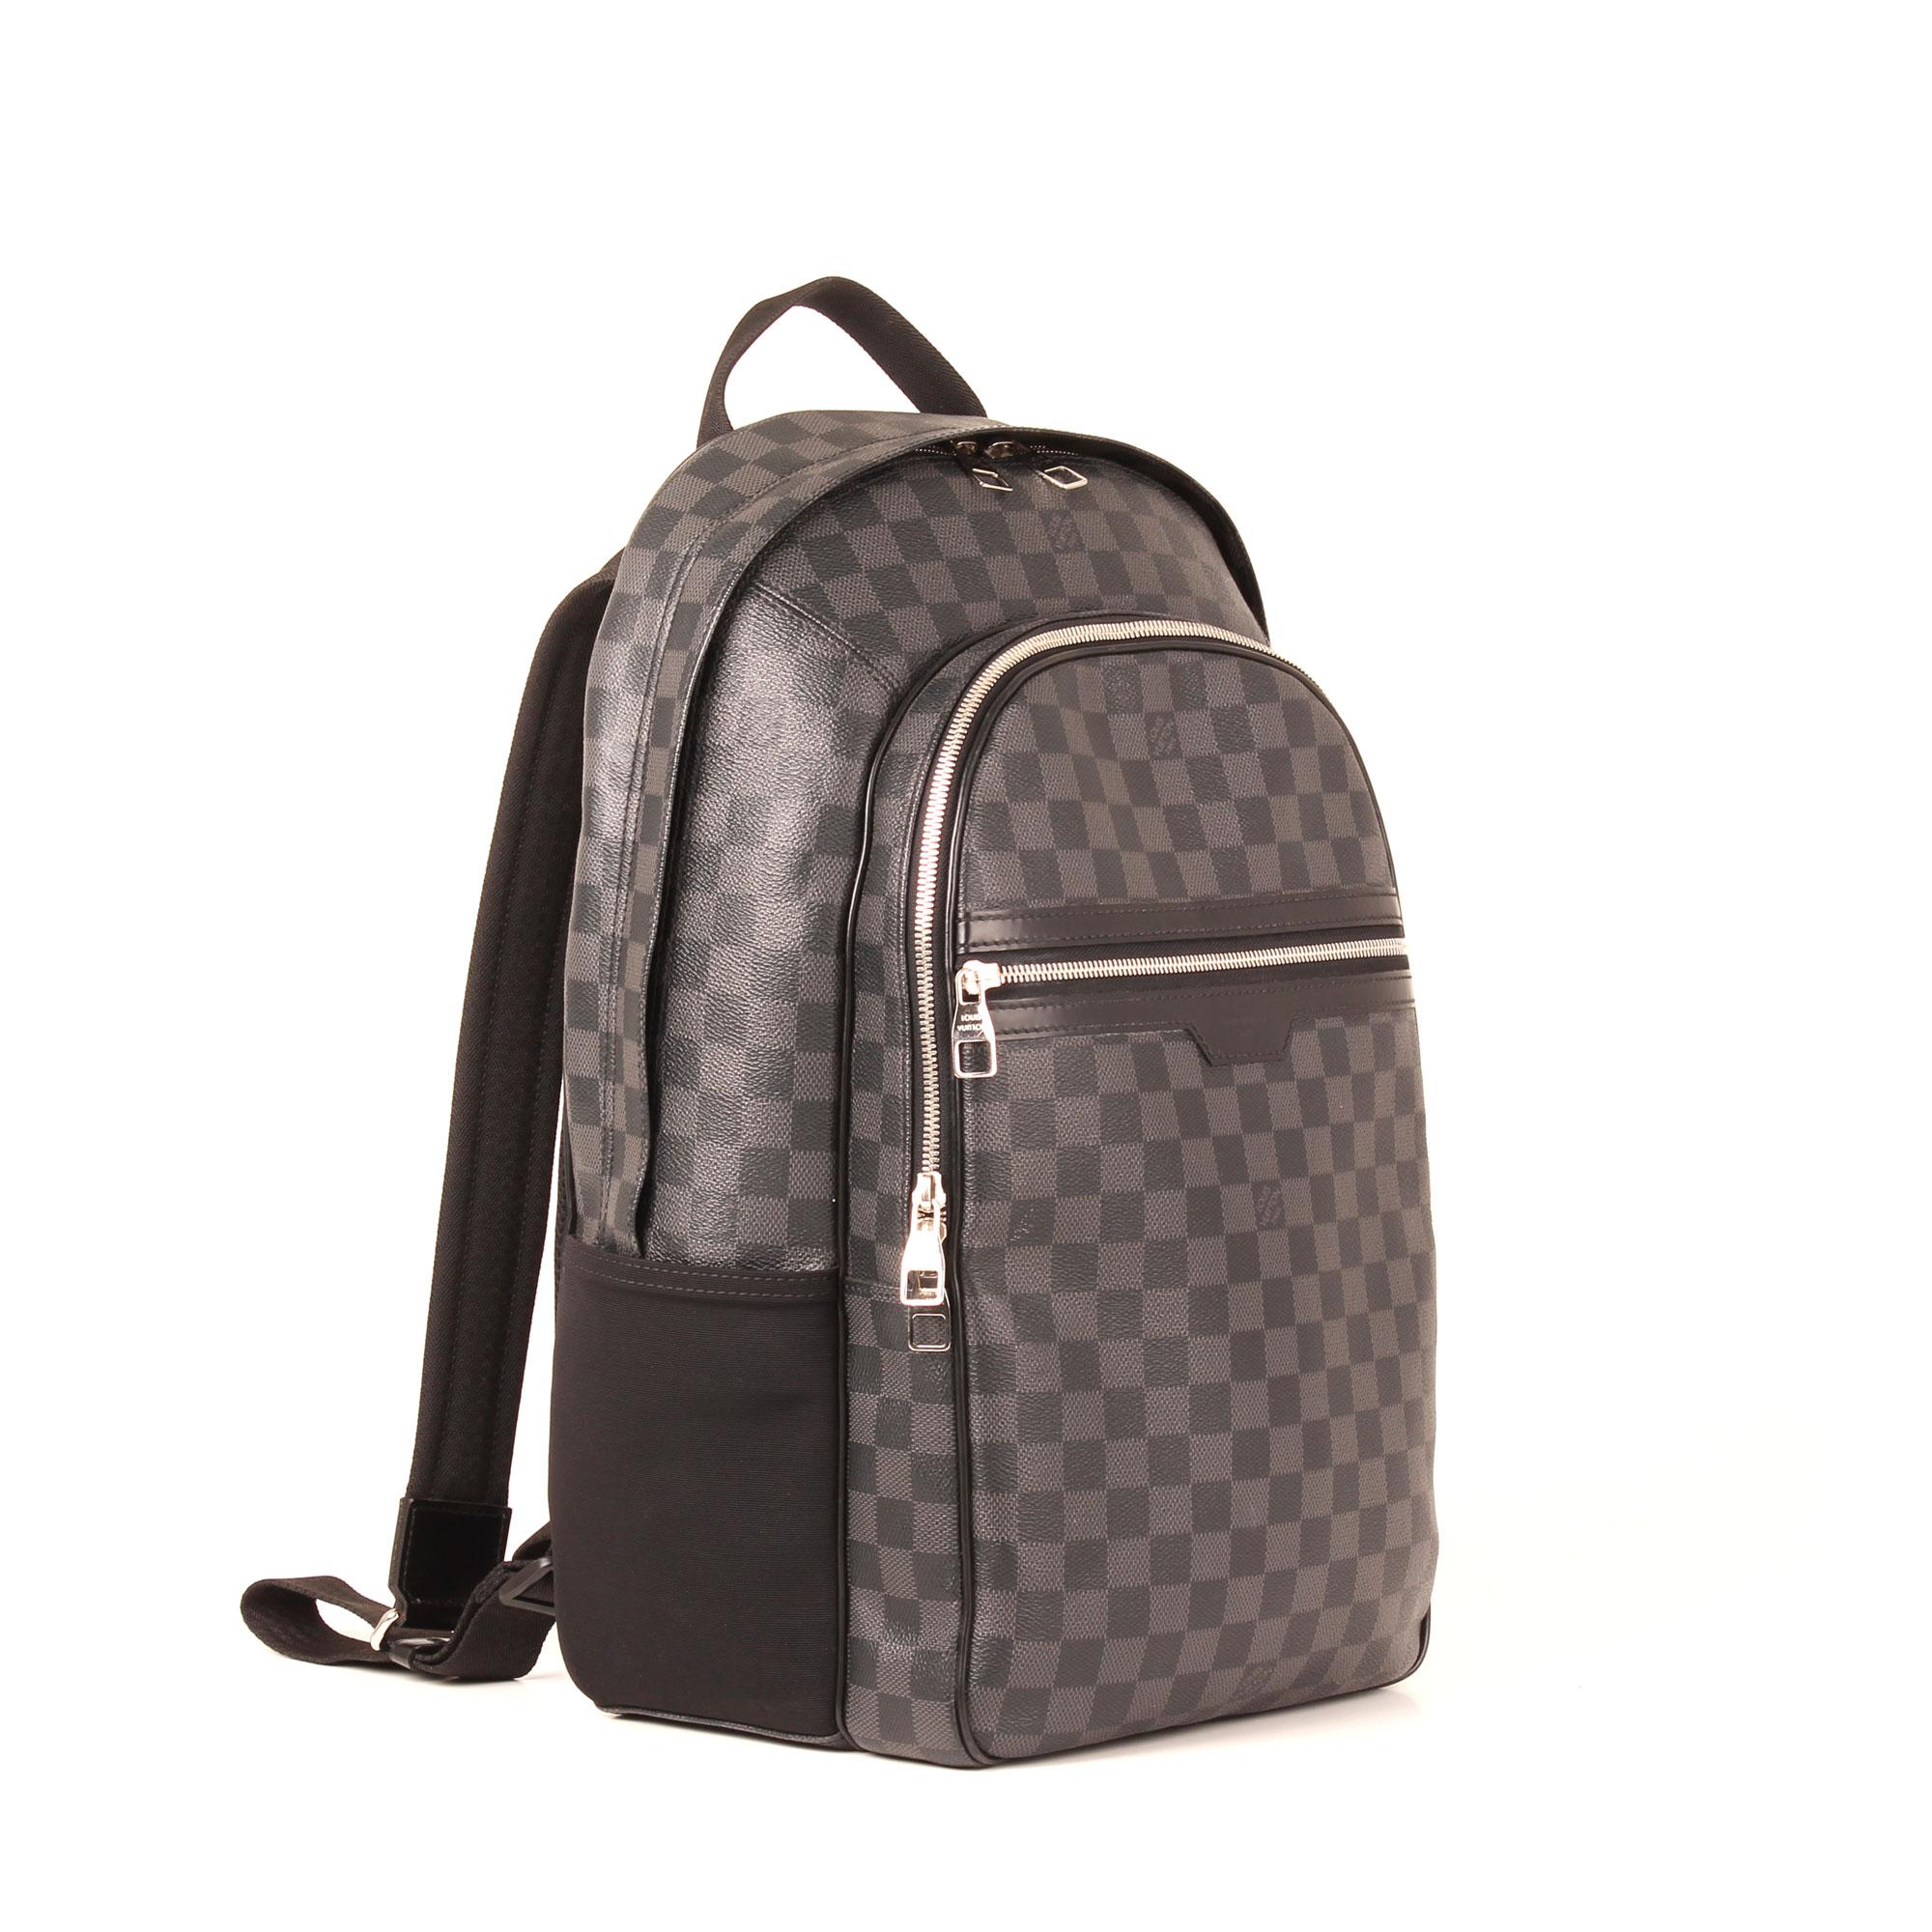 7d4e08646 Mochila Hombre Louis Vuitton Precio | Stanford Center for ...